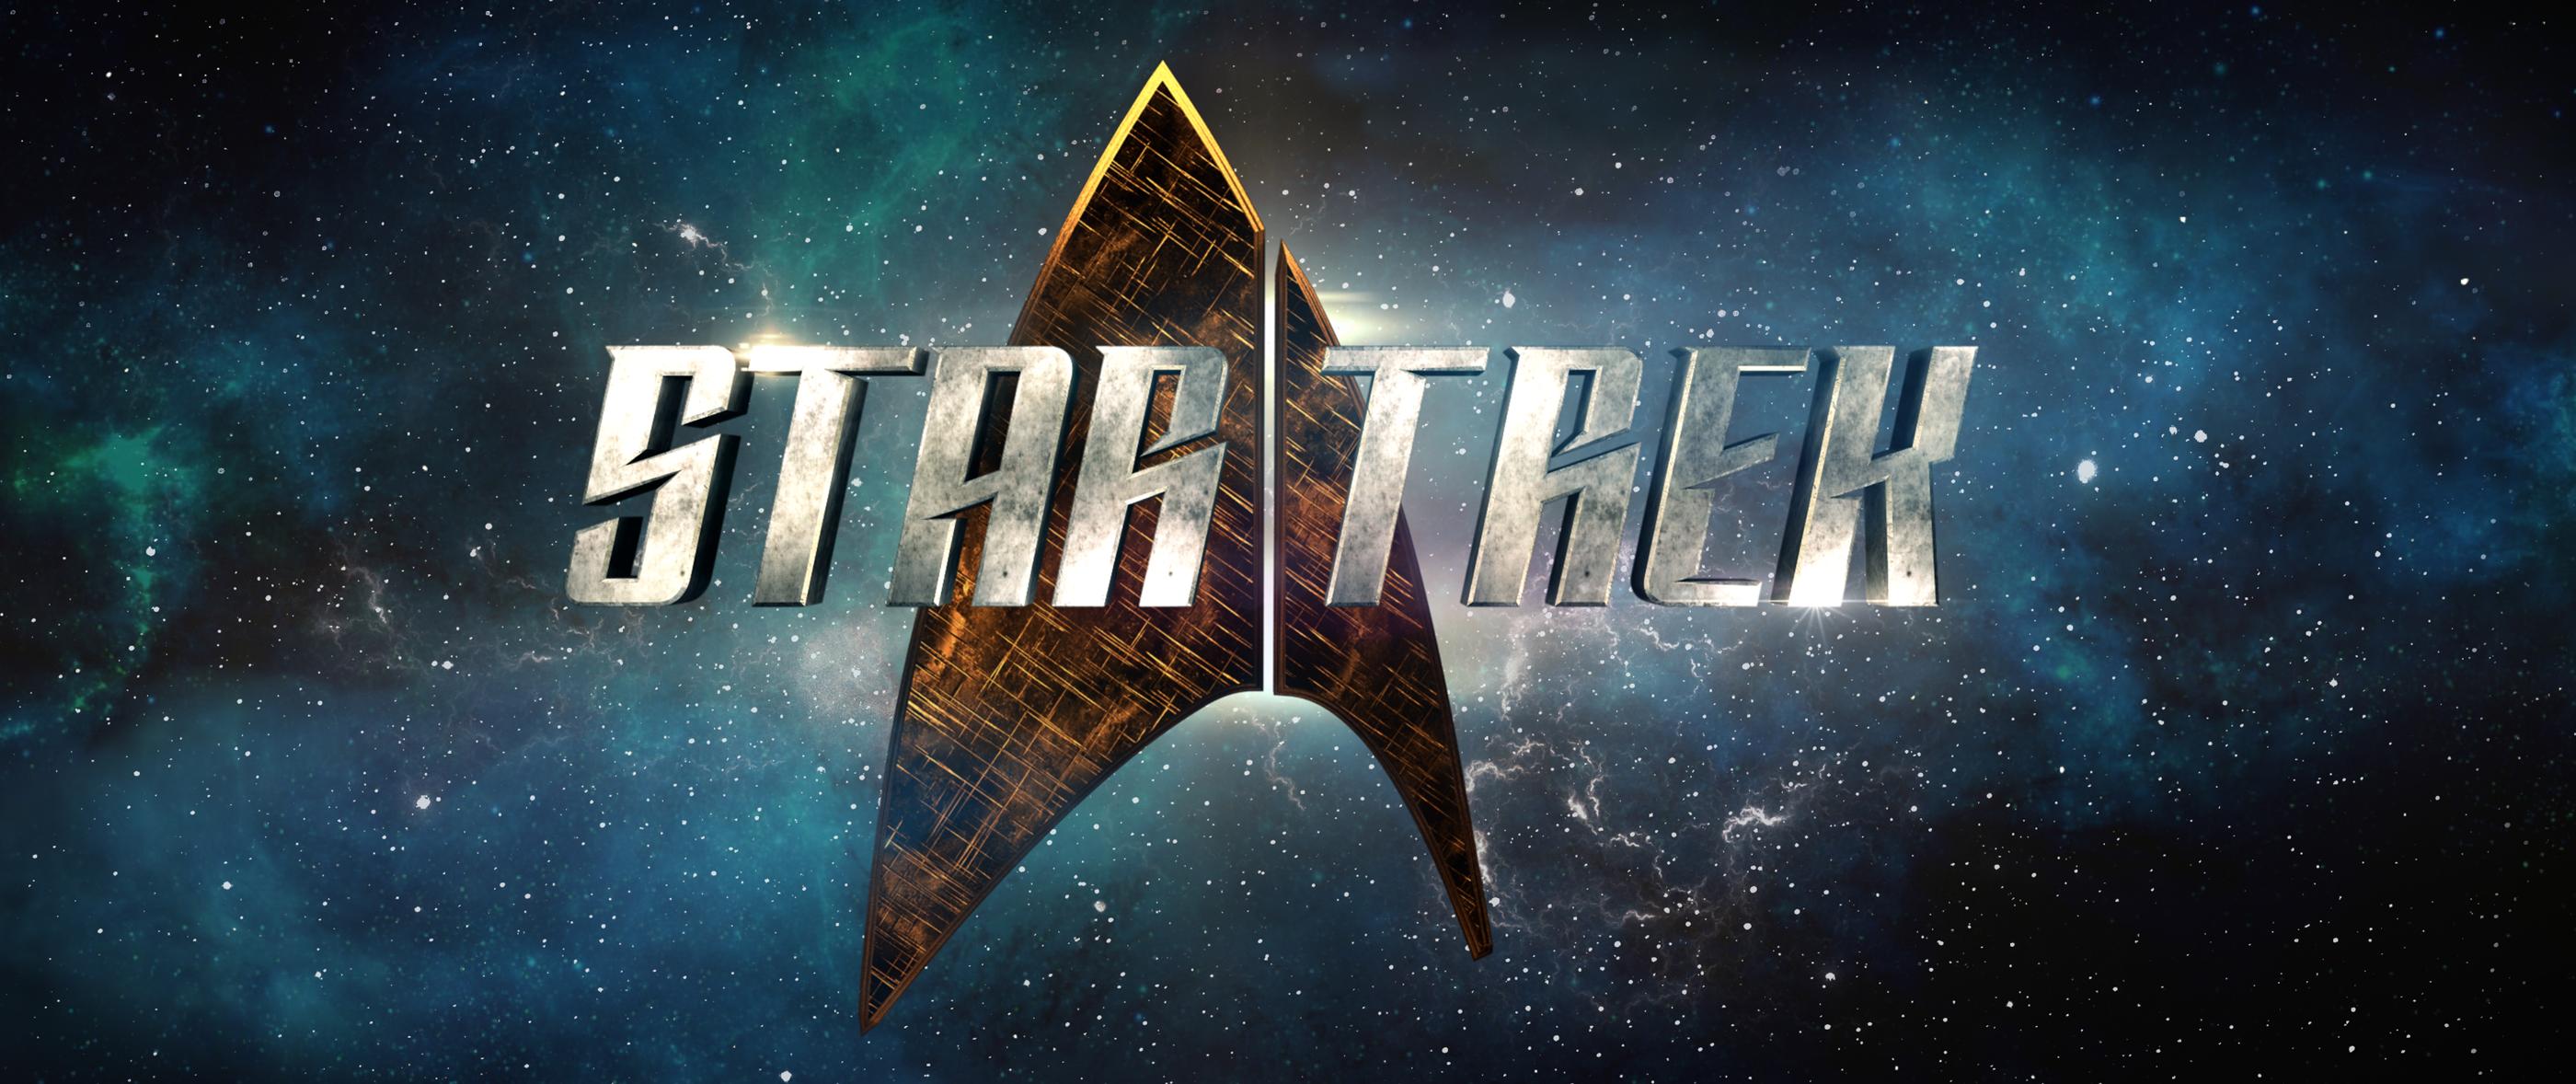 Star Trek Pics, Comics Collection